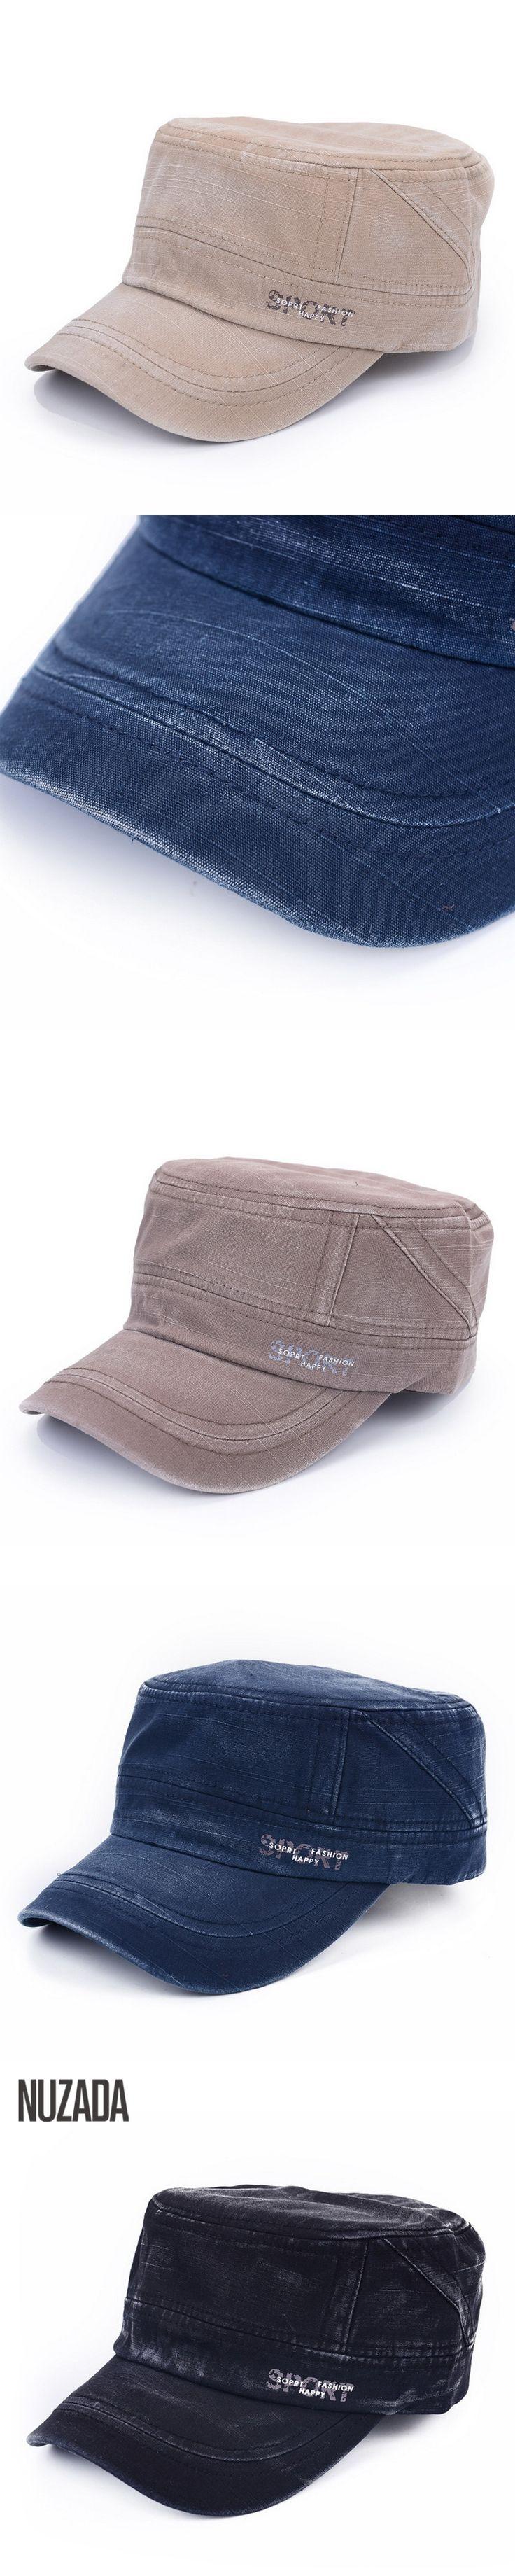 Brand NUZADA 2017 Classic Unisex Flat Top Cap Military Hats For Men Women 100% Cotton Stitching Spring Summer Visor Hat pdd-003